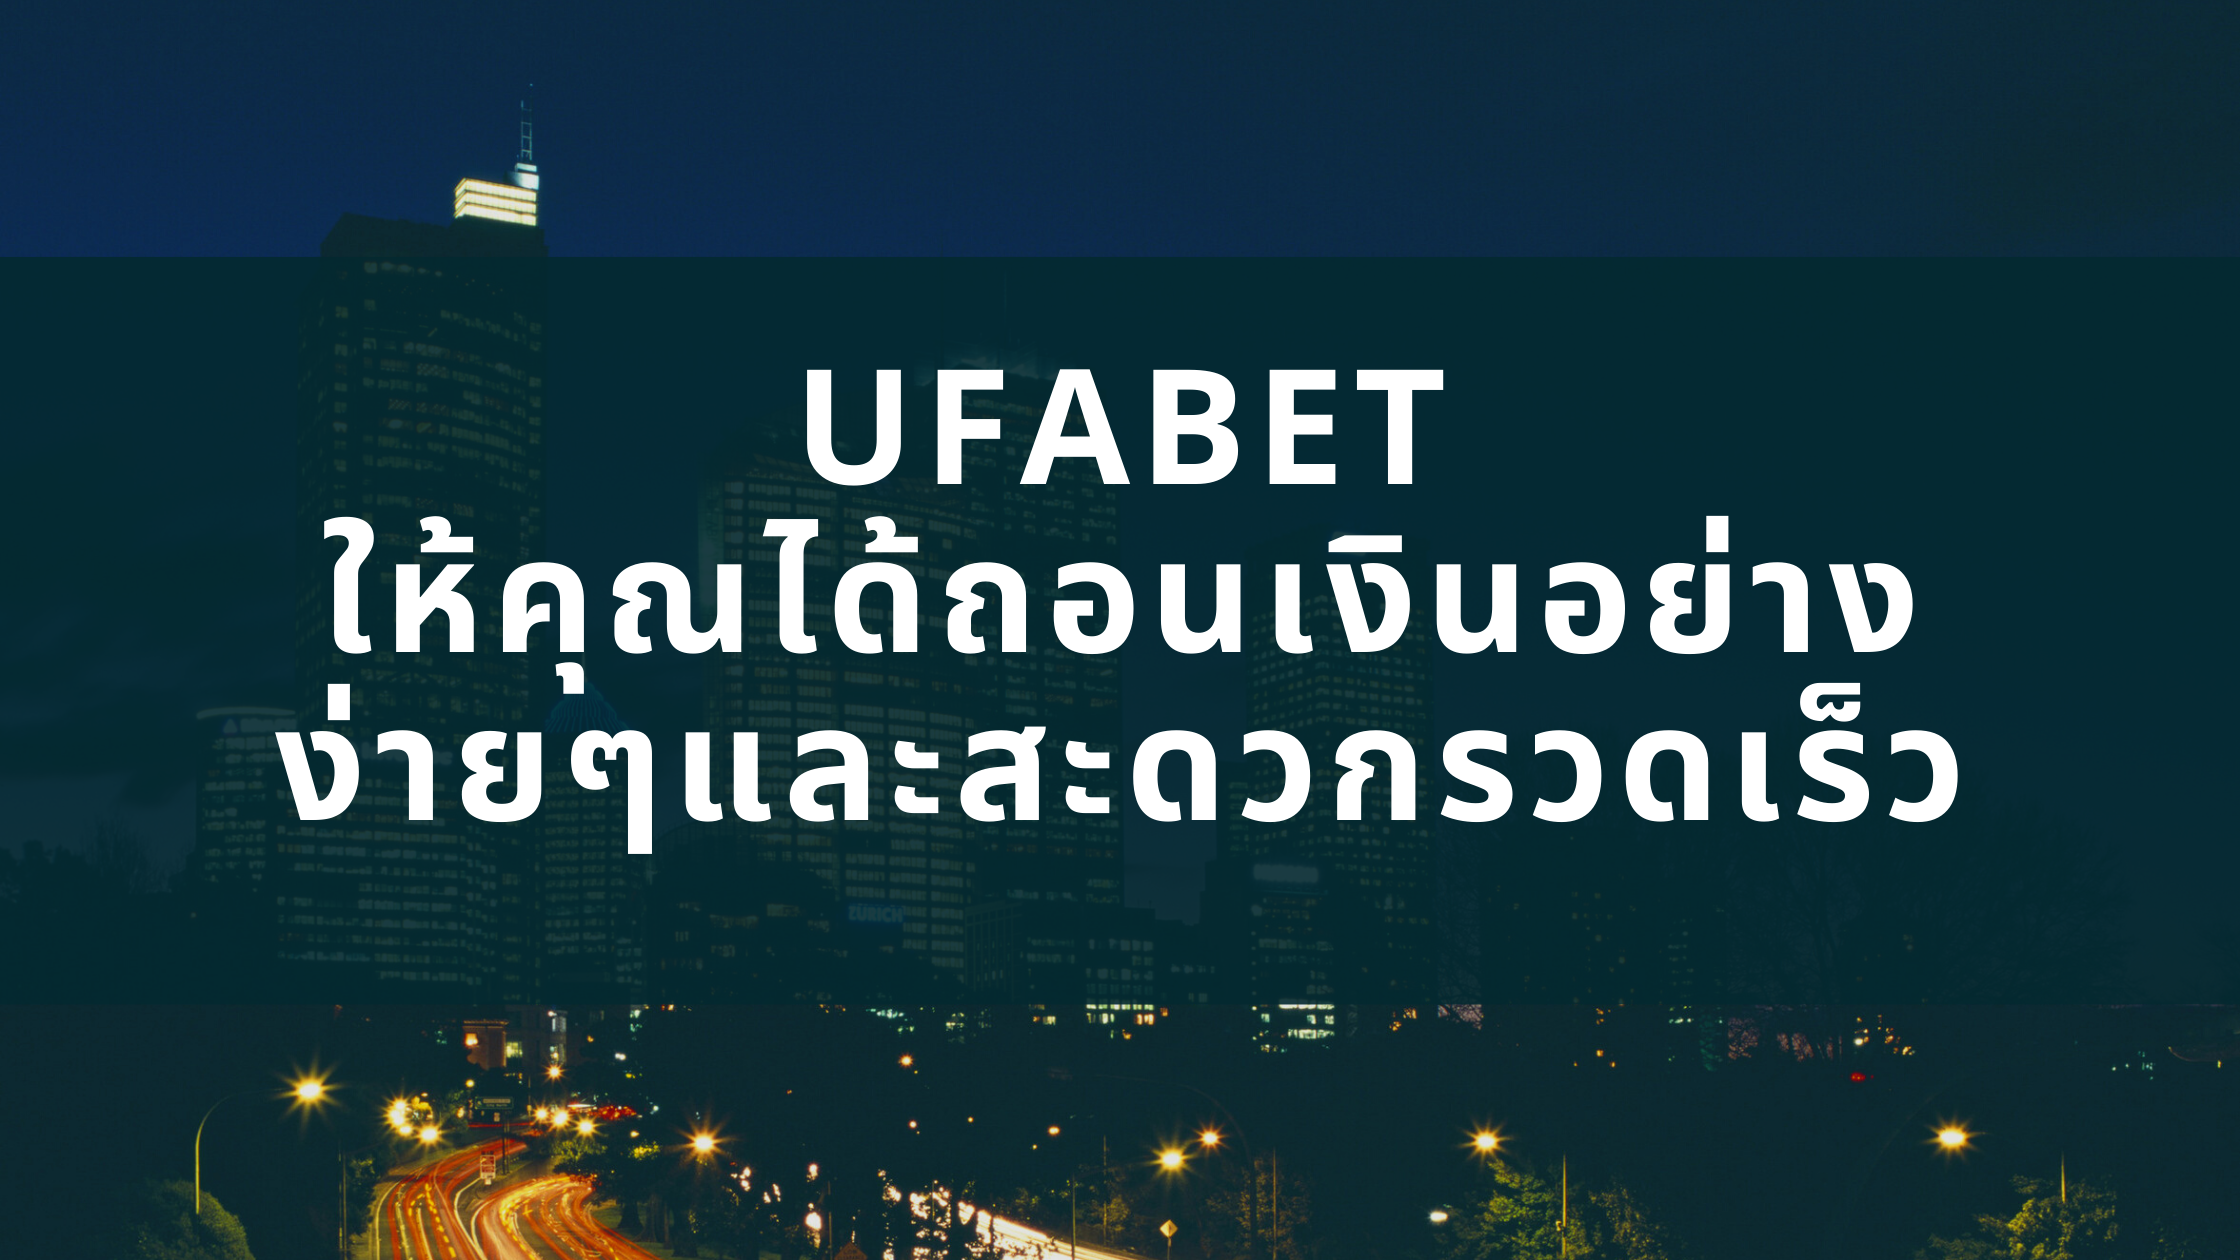 UFABET ให้คุณได้ถอนเงินอย่างง่ายๆและสะดวกรวดเร็ว